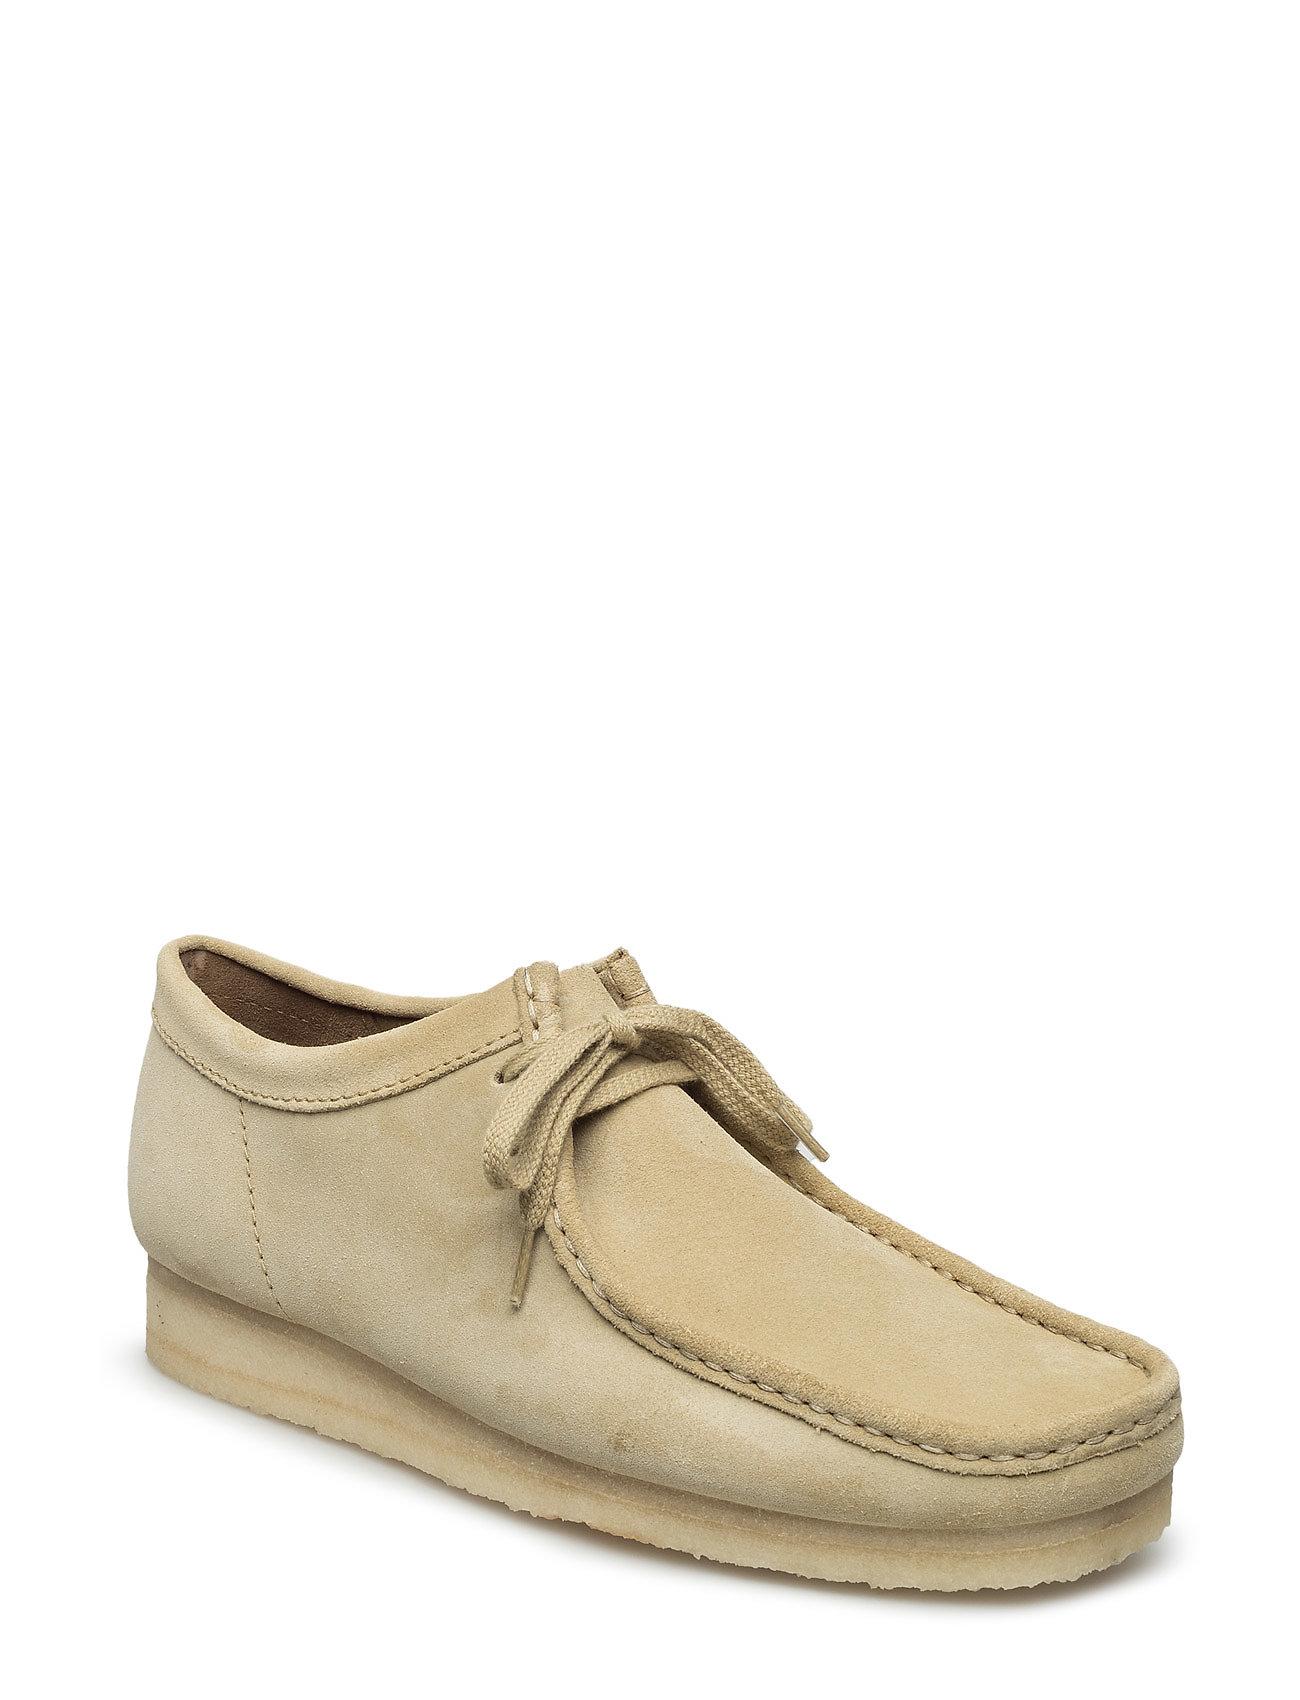 Wallabee Clarks Casual sko til Herrer i